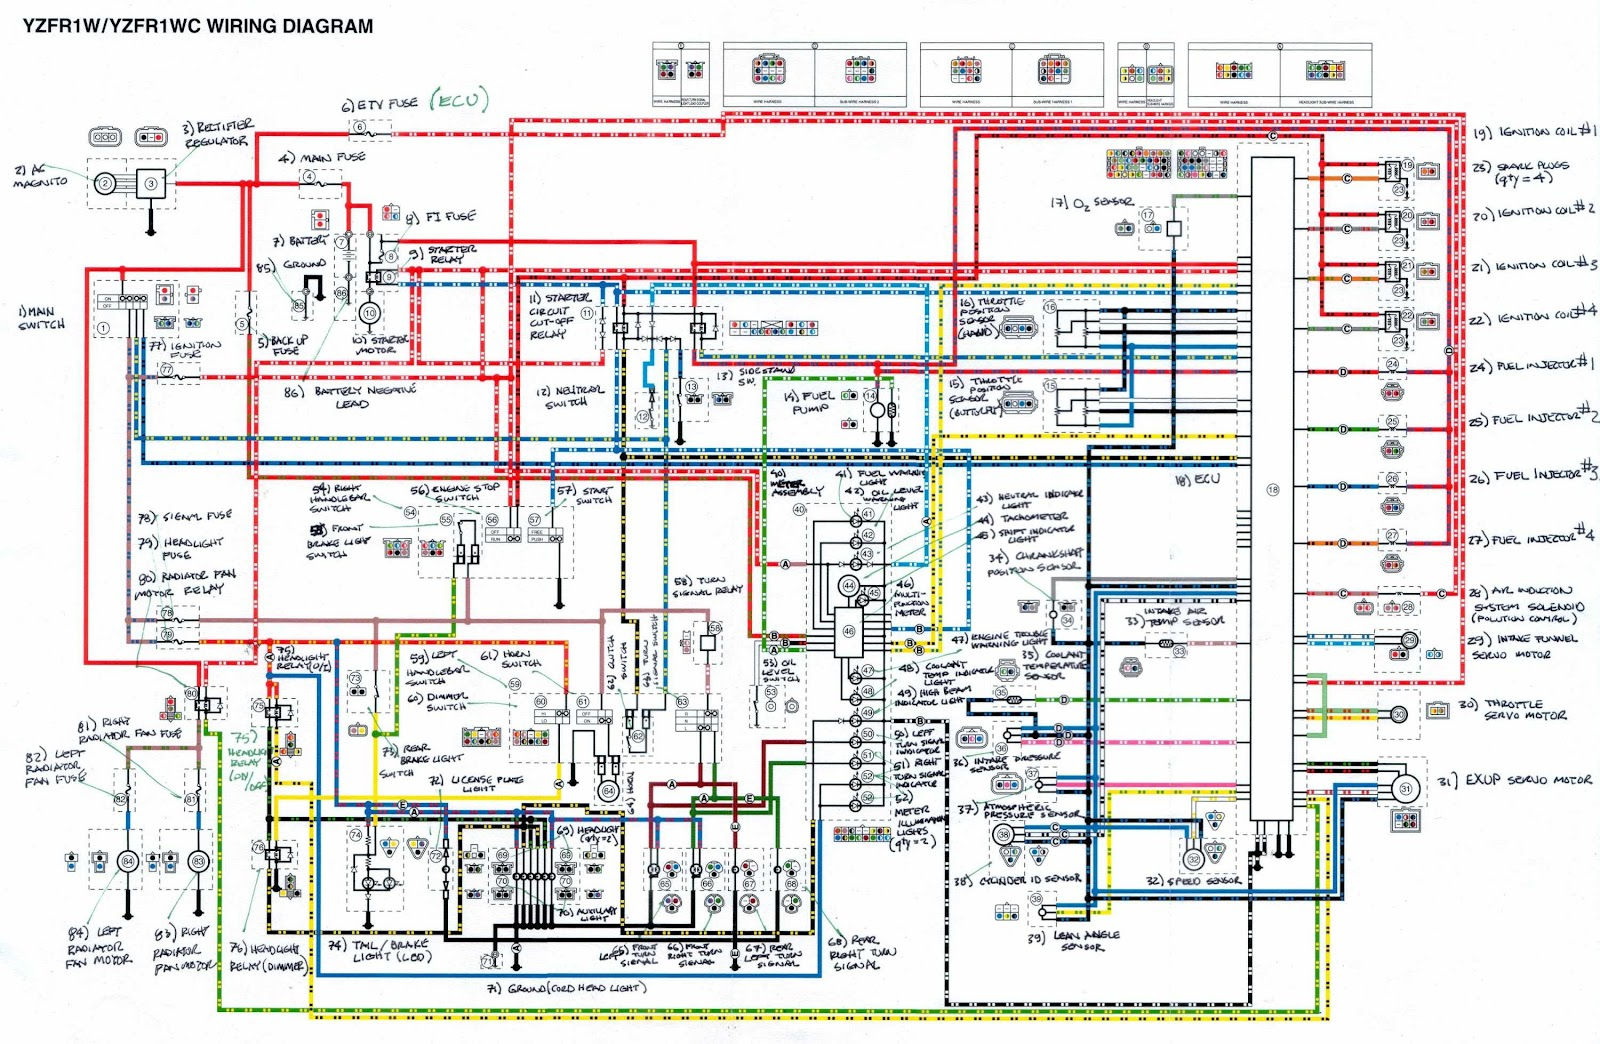 Yamaha Mio Mx Wiring Diagram: Yamaha Mio Mx 125 Wiring Diagram - efcaviation.comrh